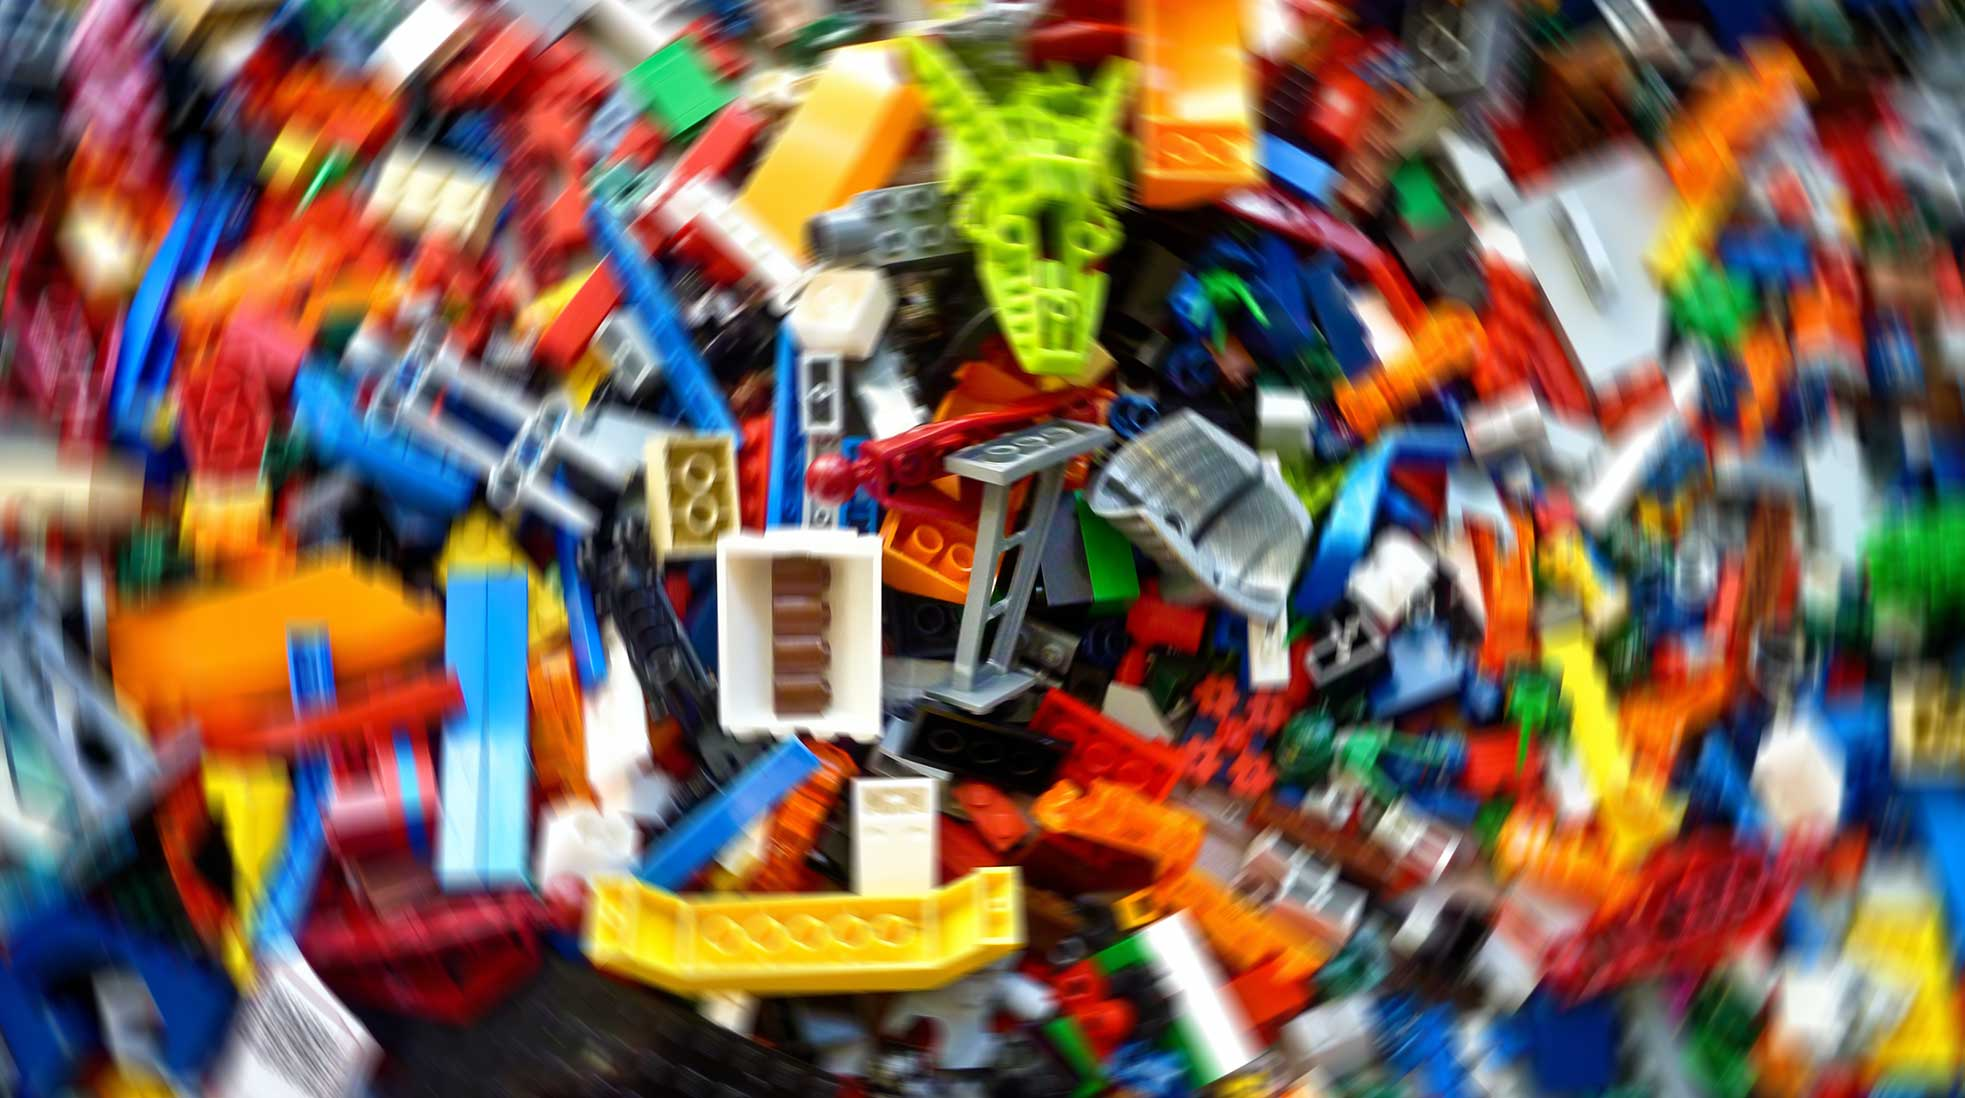 Lego. Photo: Rick Mason / Unsplash (image has been modified)